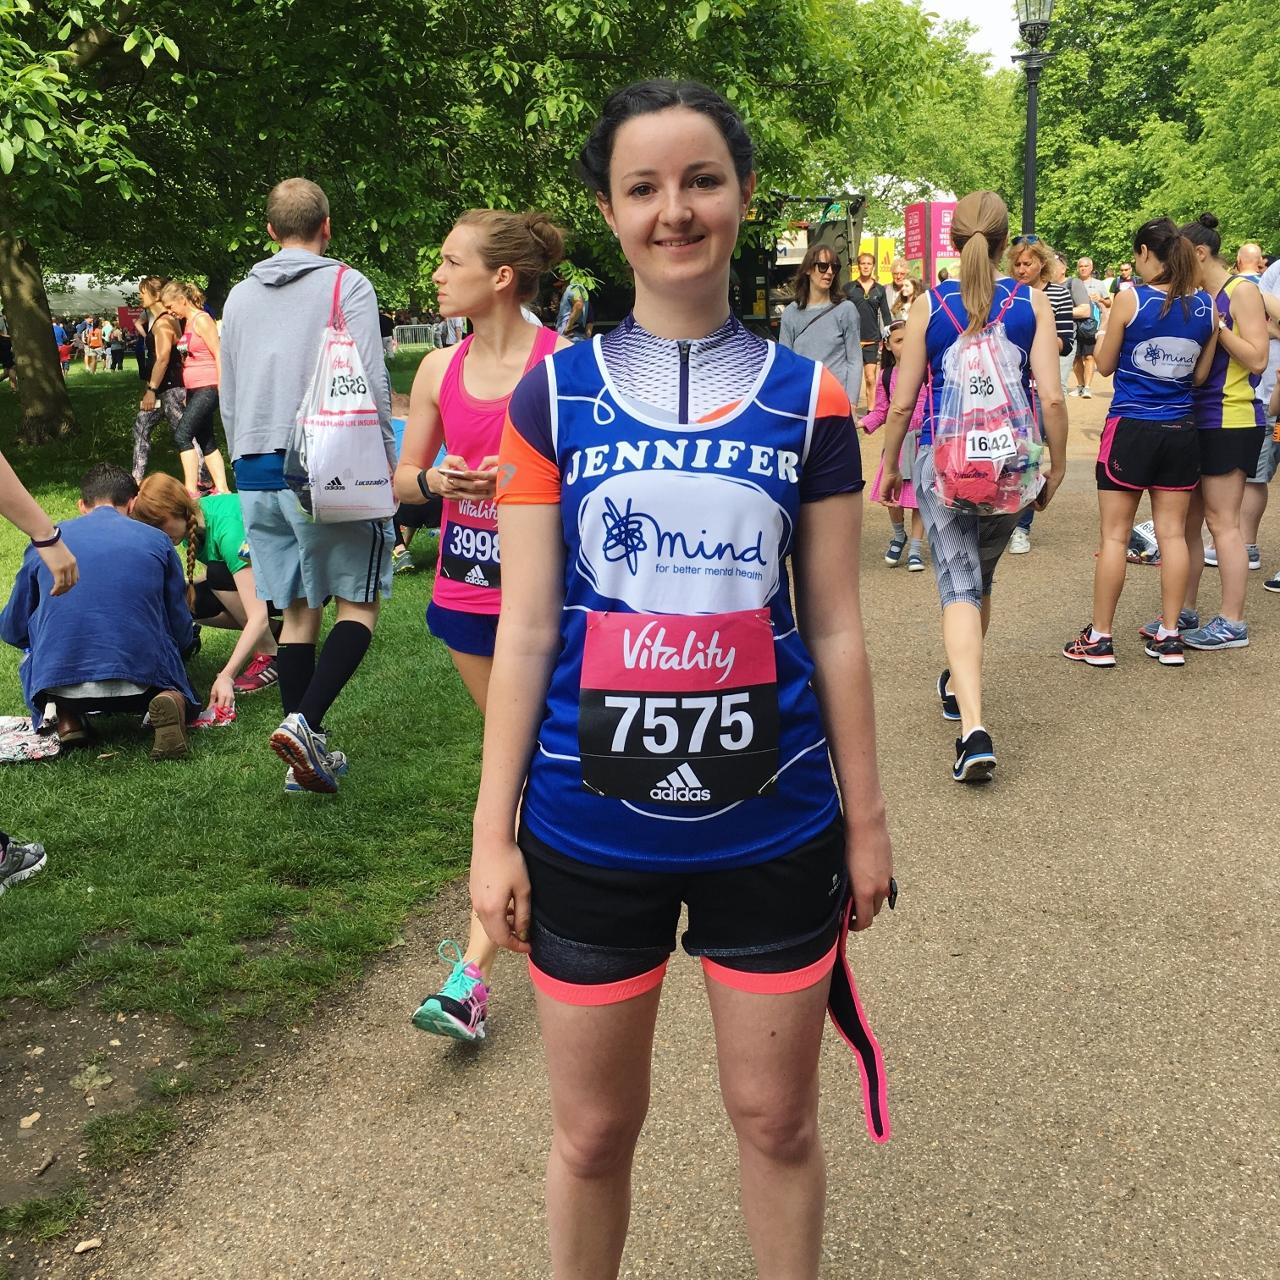 Running Vitality London 10k